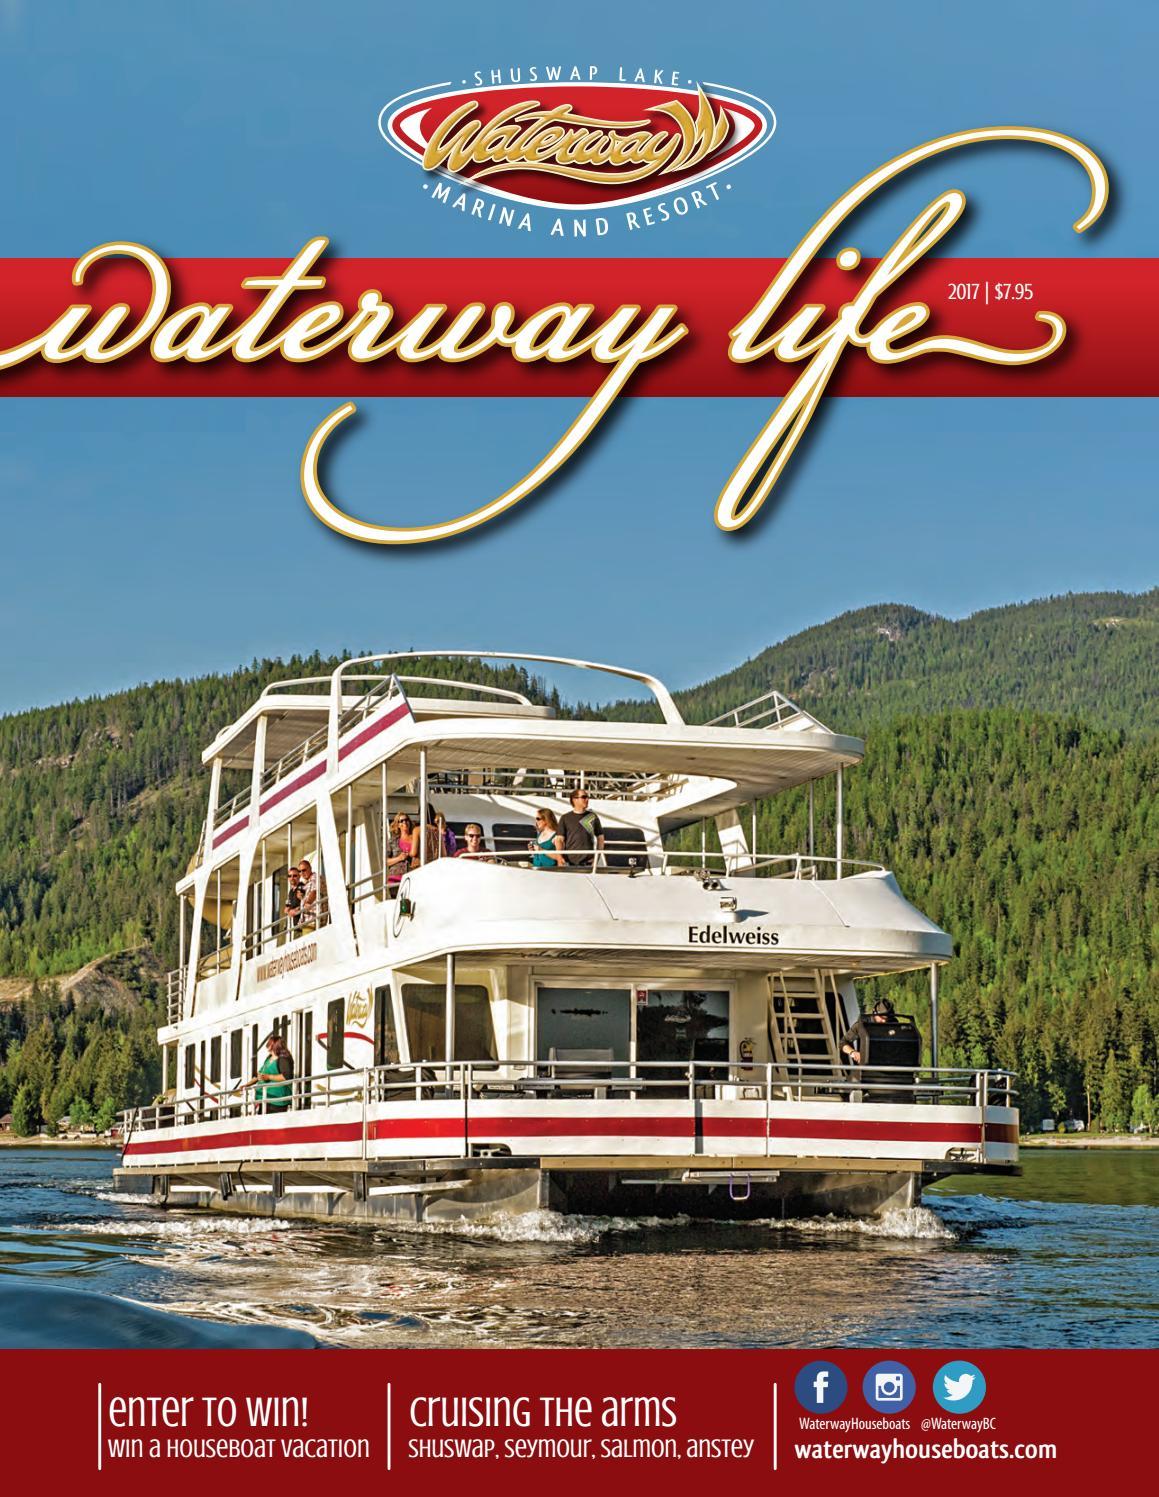 Waterway Life 2017 by Waterway Houseboats - issuu